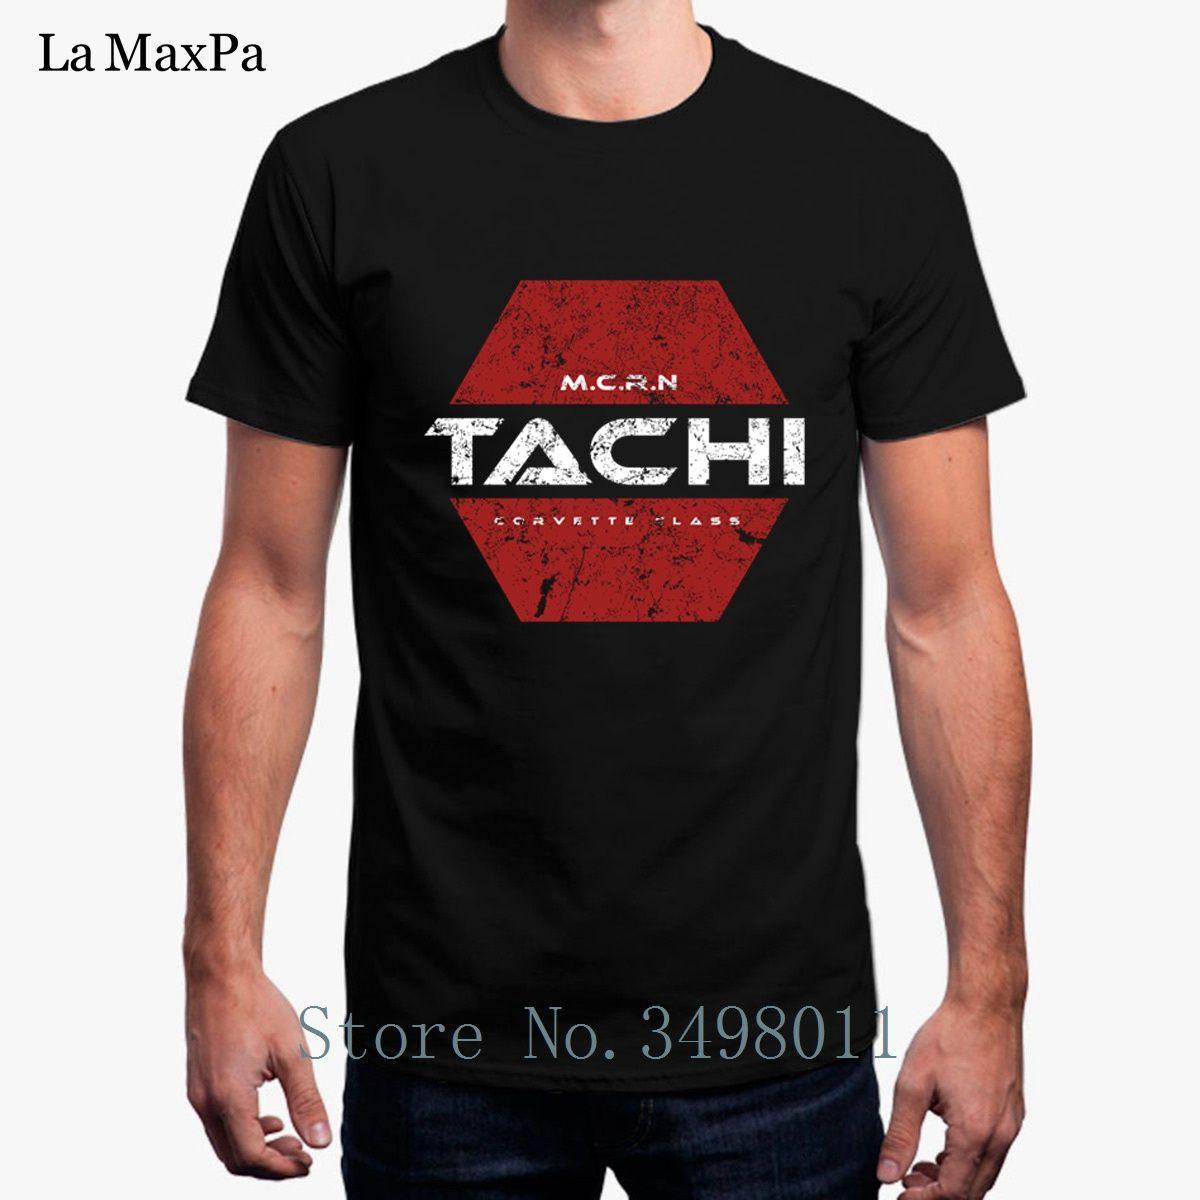 e06477121ee New Men S T Shirt Tachi Tshirt Clothing Cotton Fitness Short Sleeves T  Shirt Men Plus Size 3xl Design Tops Camisas Slim Fit Buy Cool Shirts Online  Funny T ...